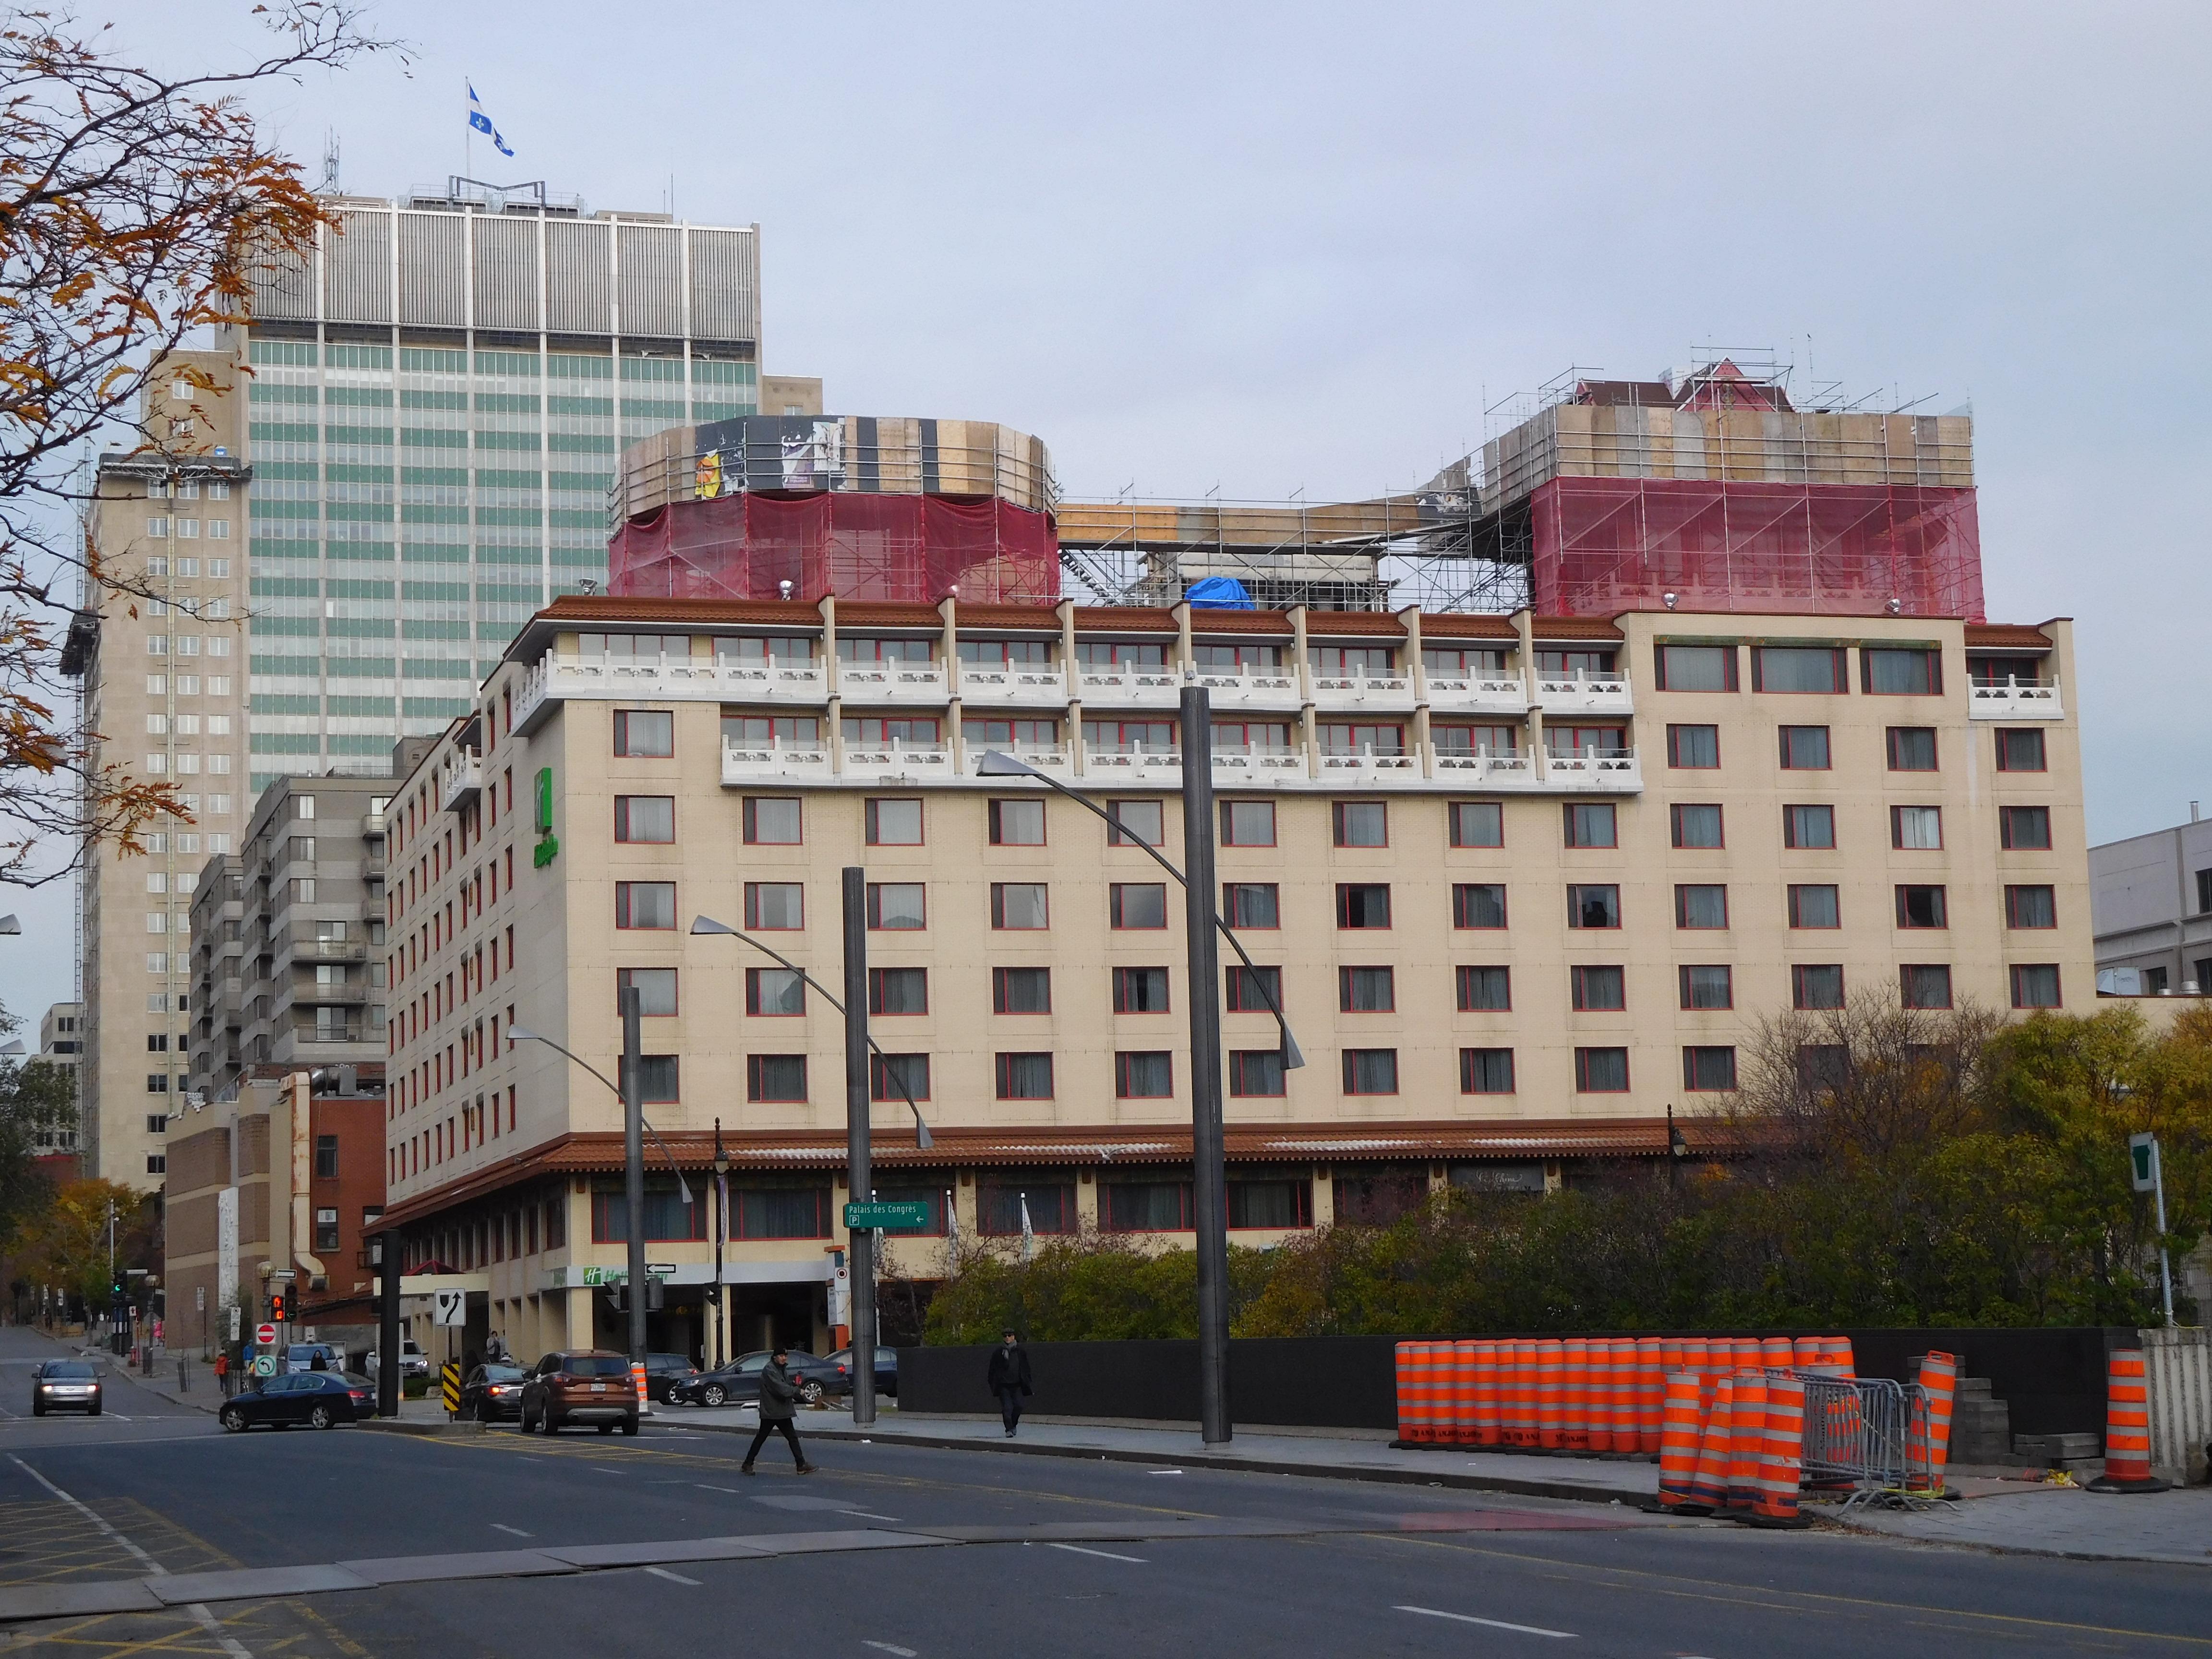 FileHoliday Inn Select Montreal Downtown